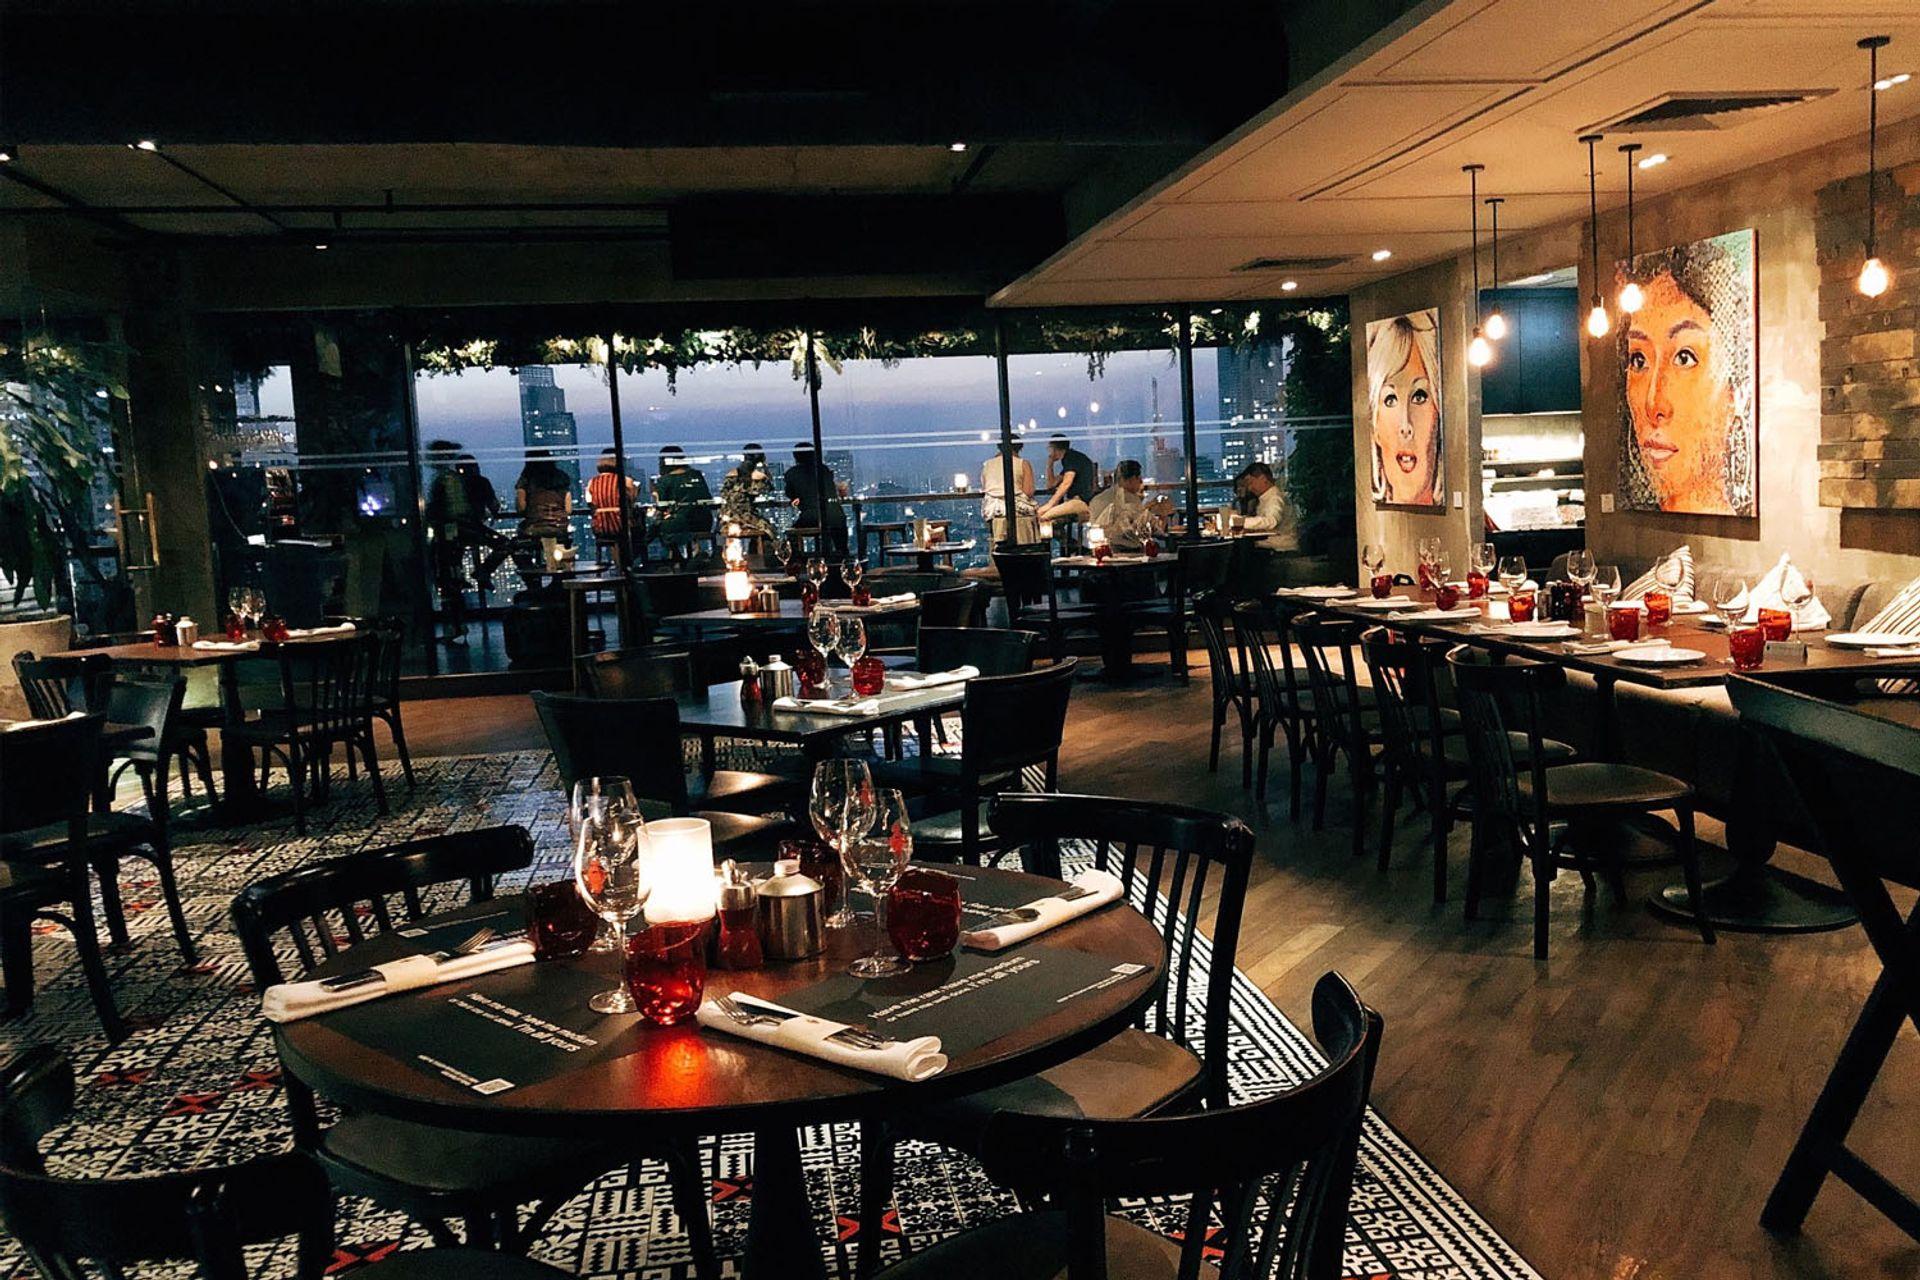 Scarlett Wine Bar and Restaurant